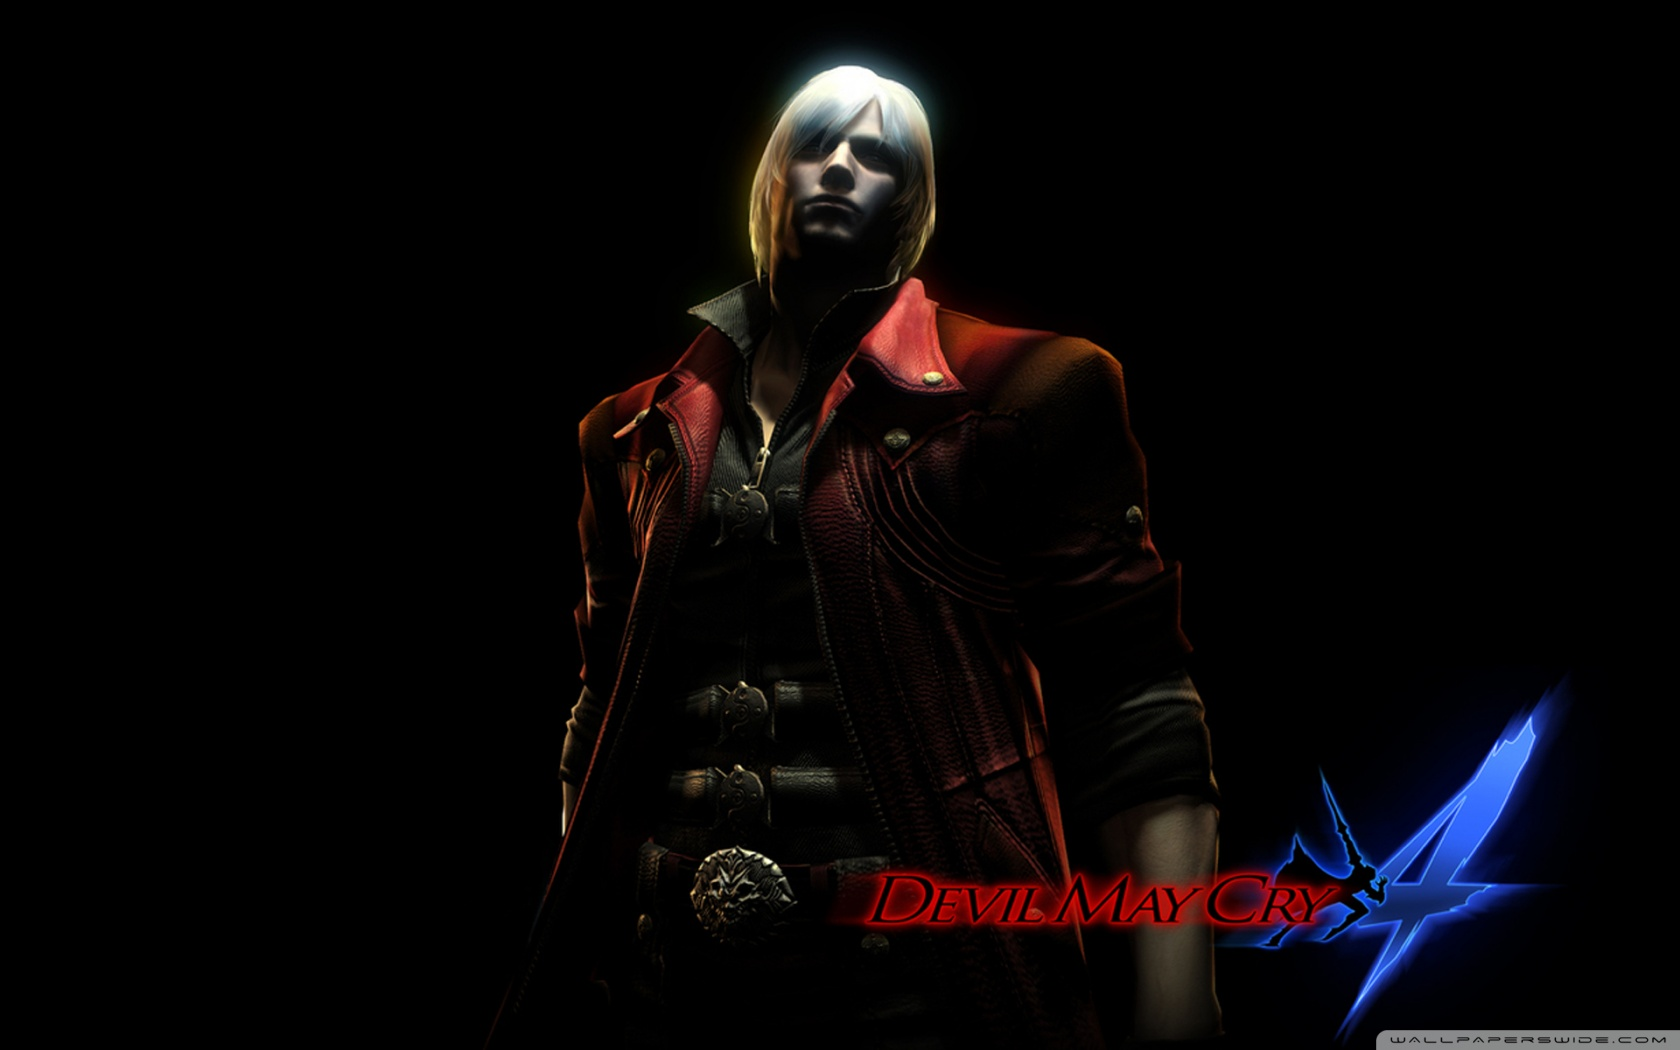 Devil May Cry 4 - Dante HD desktop wallpaper : High Definition